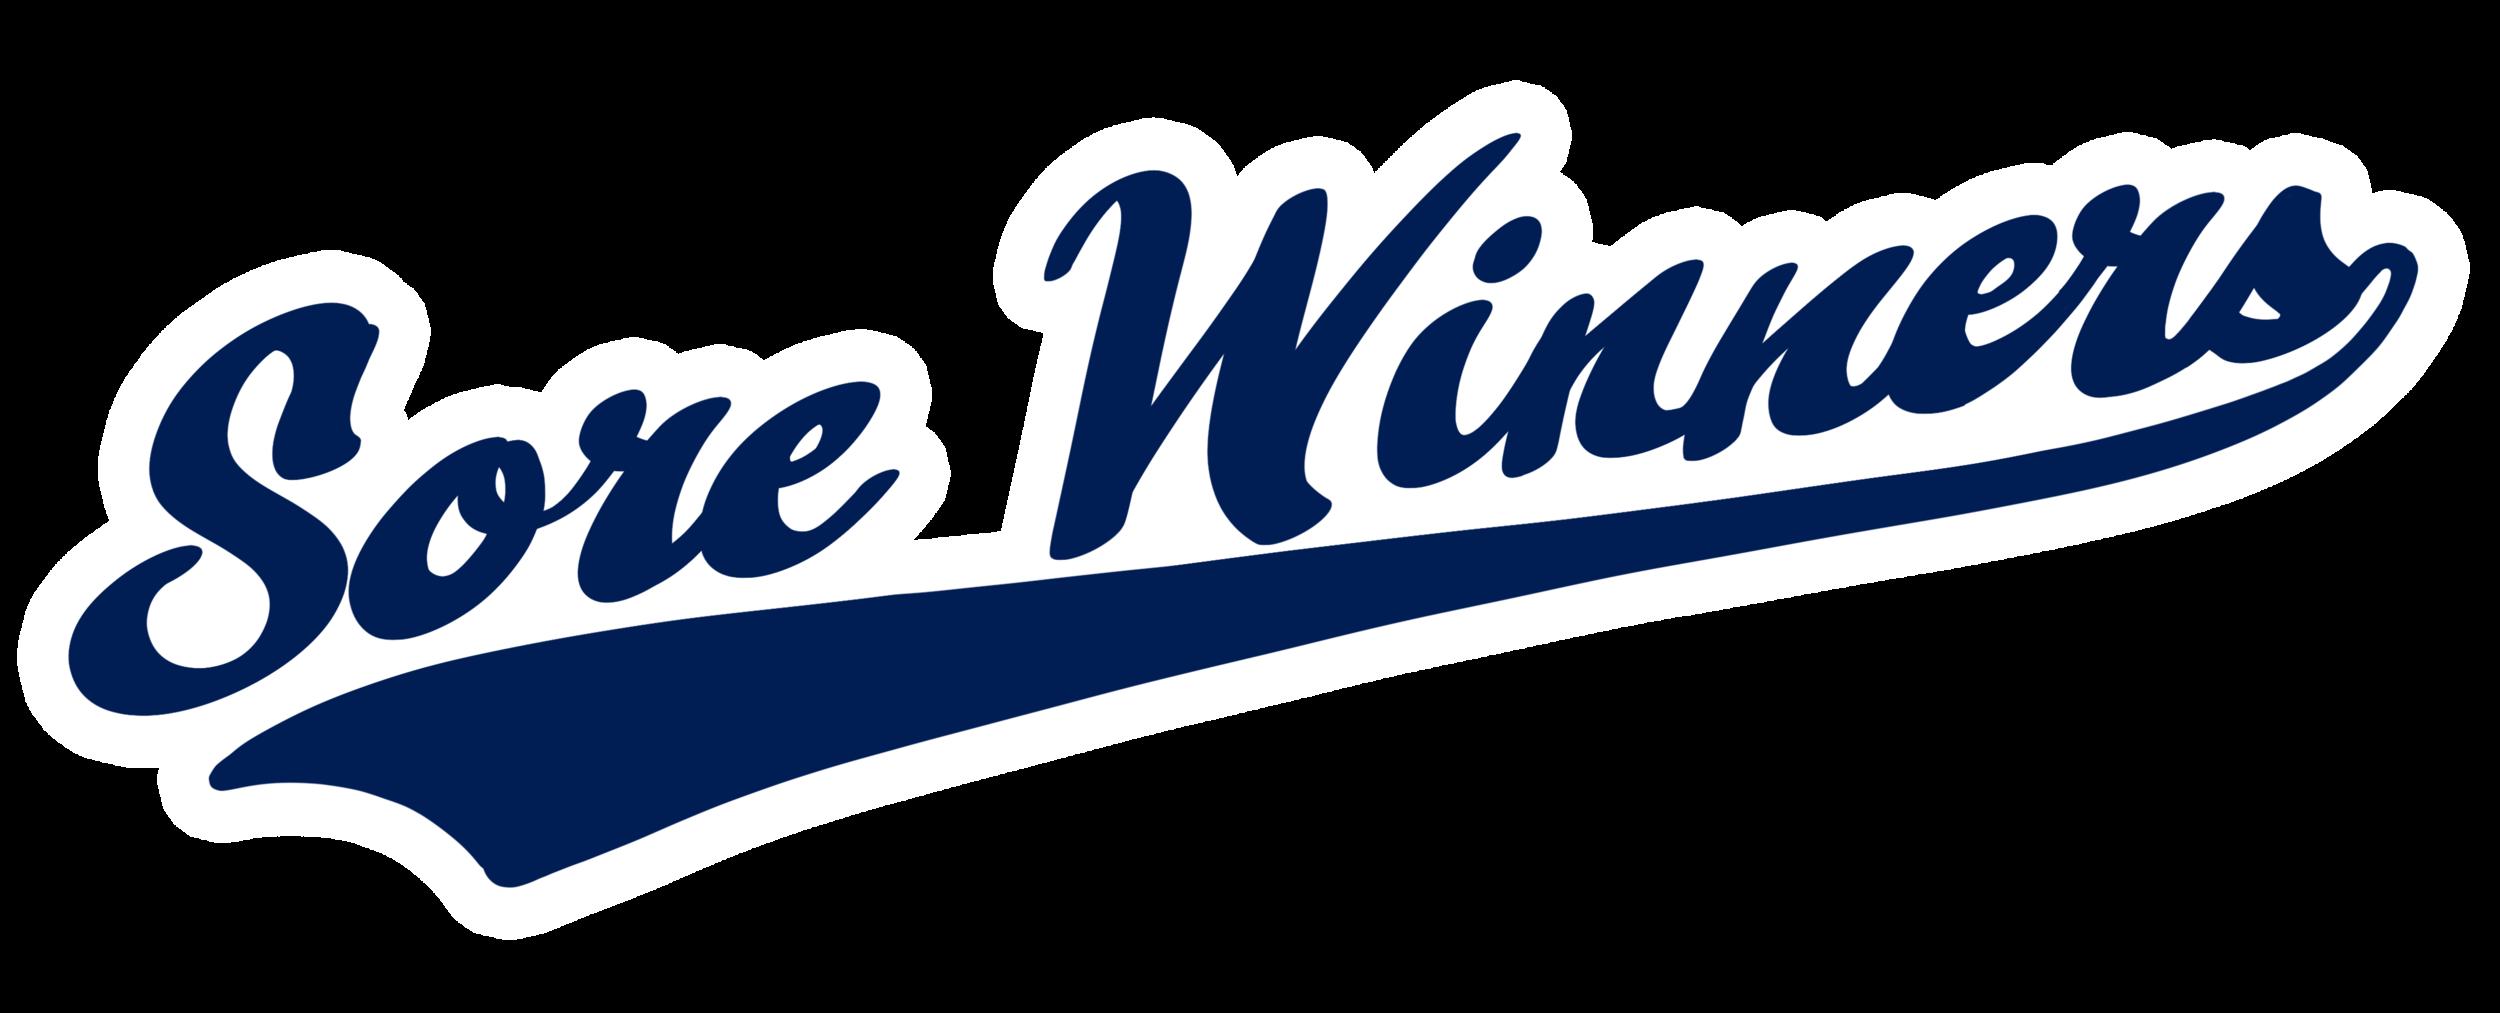 SW script logo FINAL trans.png